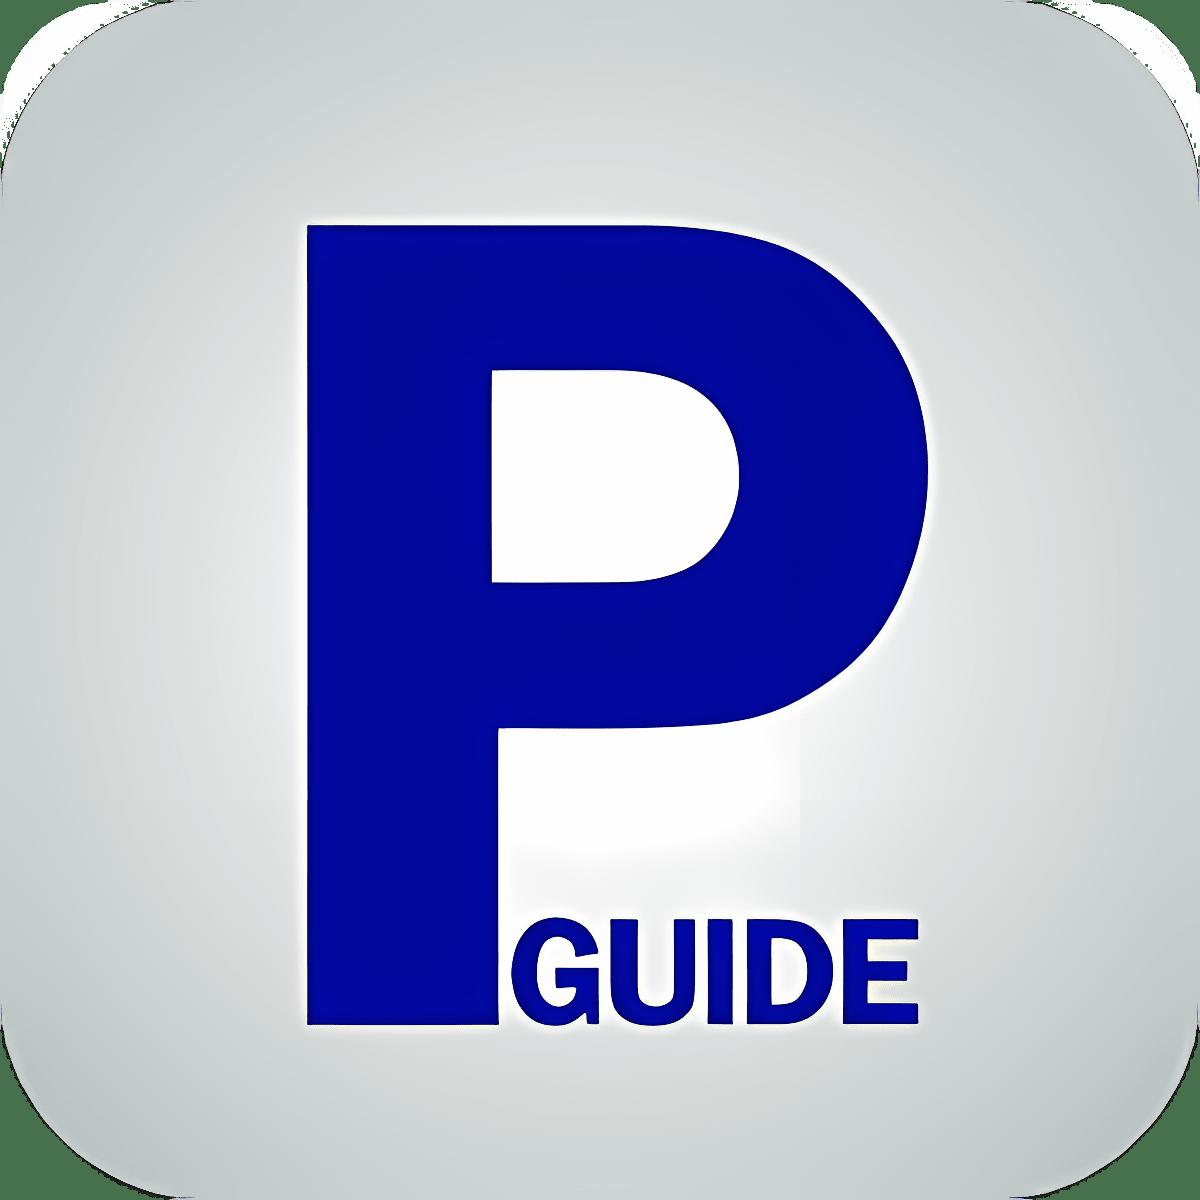 Free Pandora Music Radio Guide